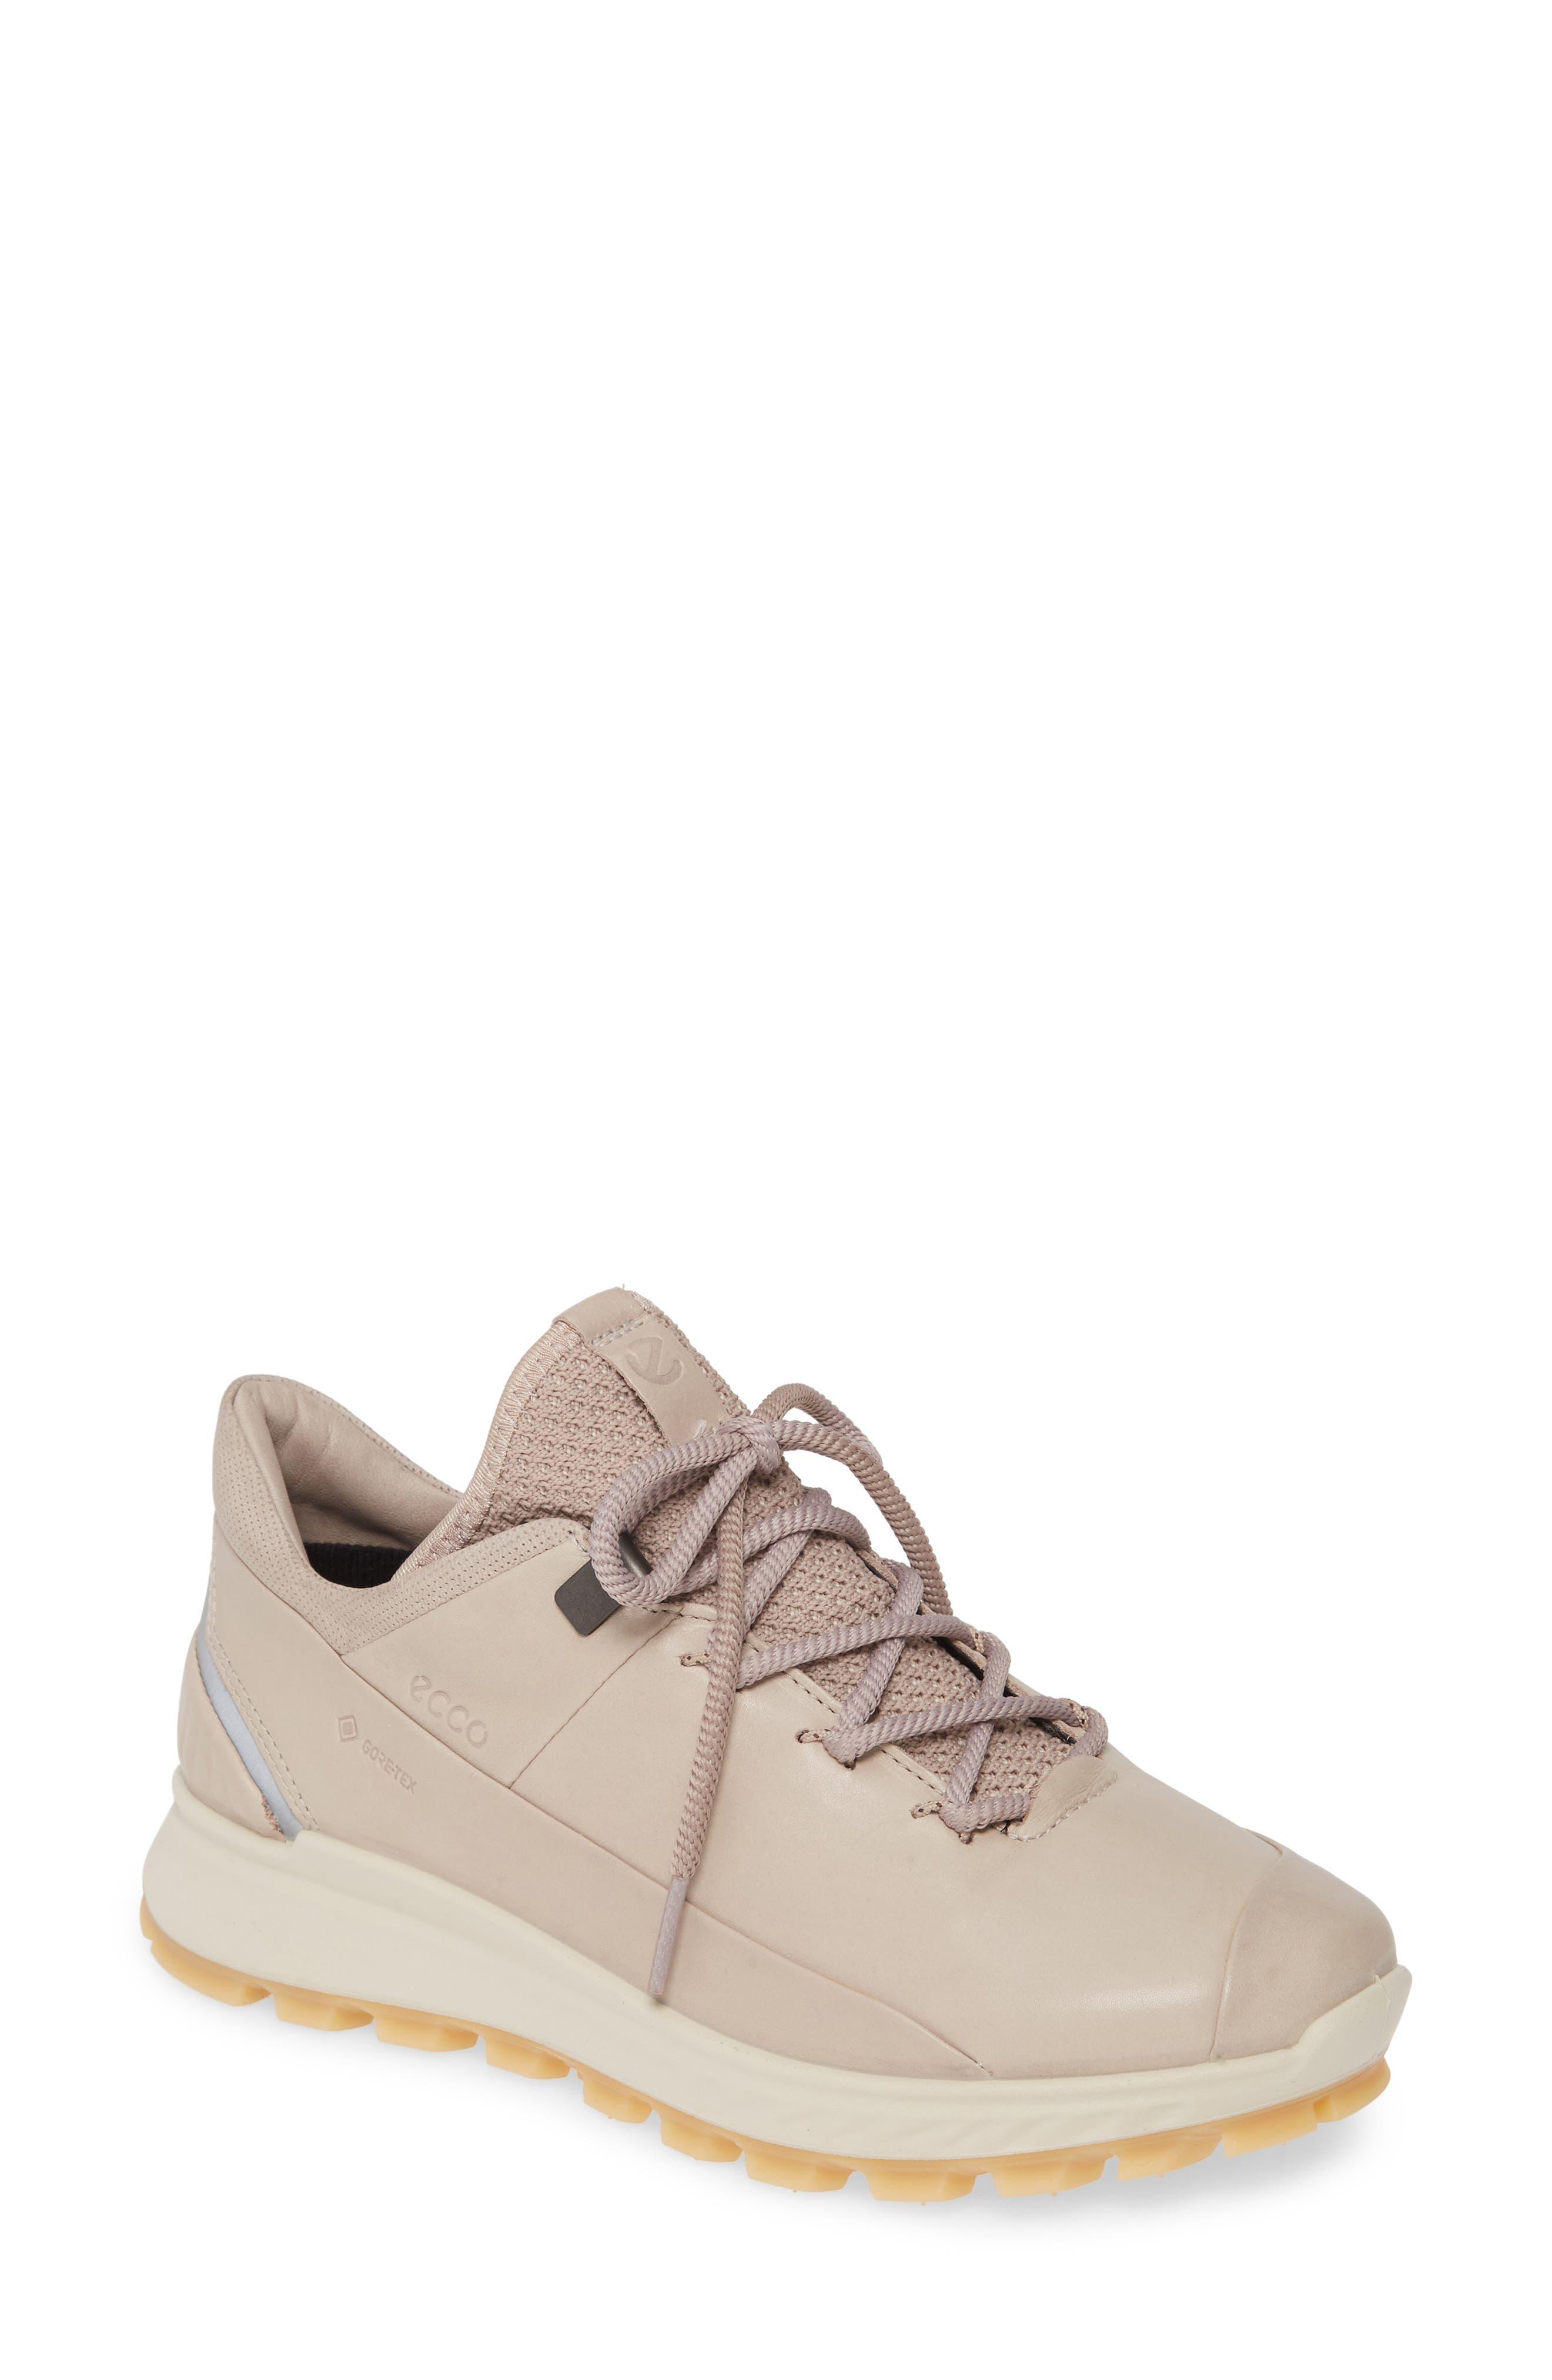 Ecco Exostrike Gore-Tex Sneaker, Grey